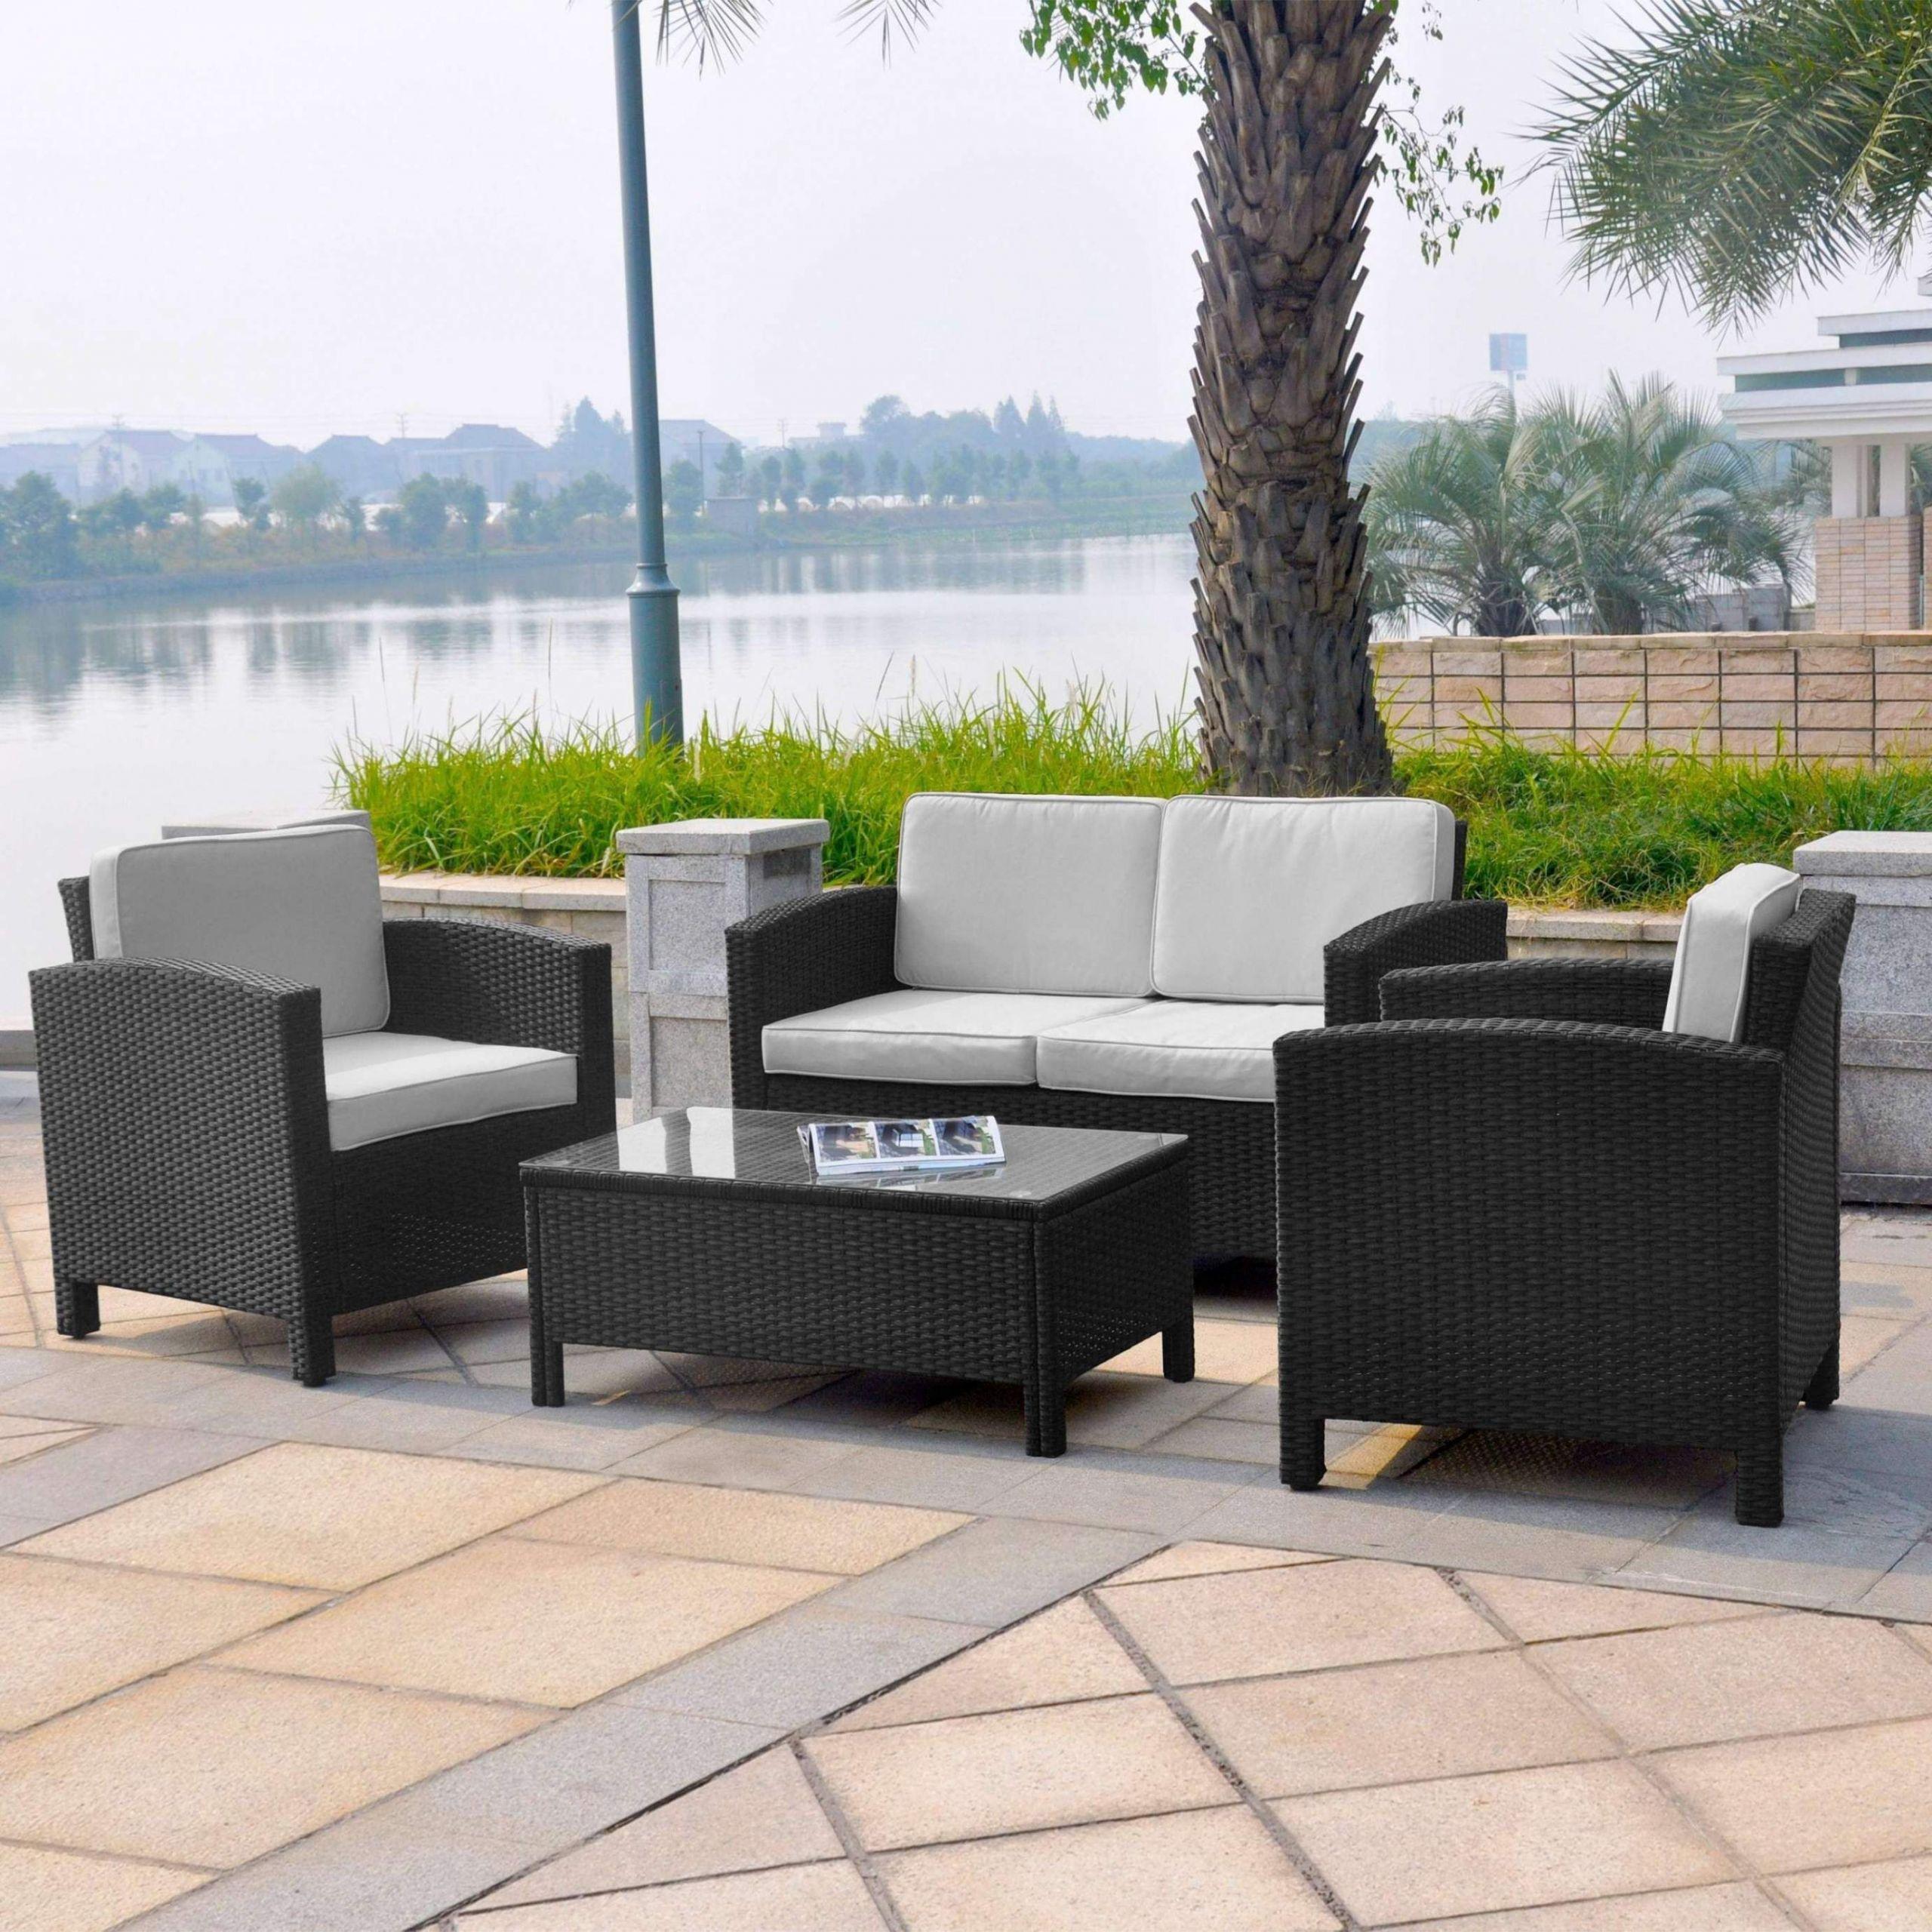 45 elegant lounge mobel galerie lounge mobel selber bauen lounge mobel selber bauen